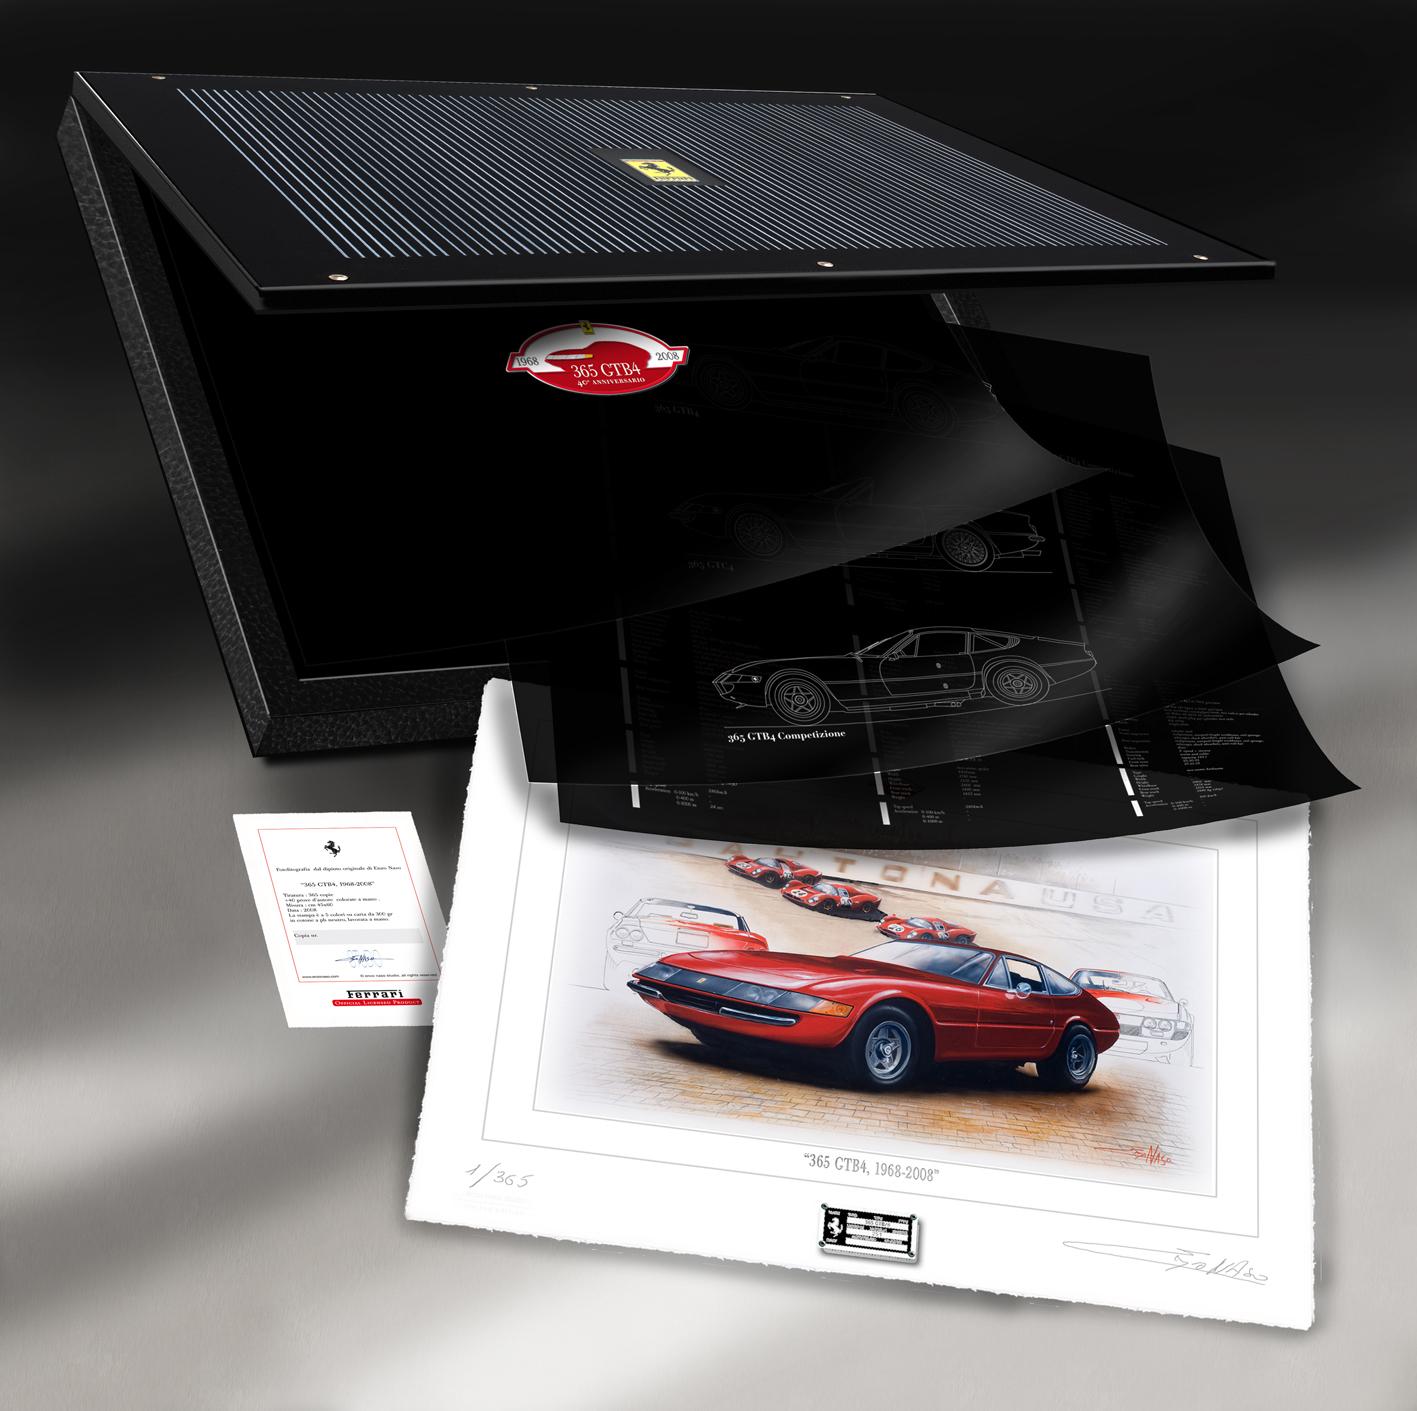 Ferrari 365 GB4 anniversary - 1968-2008